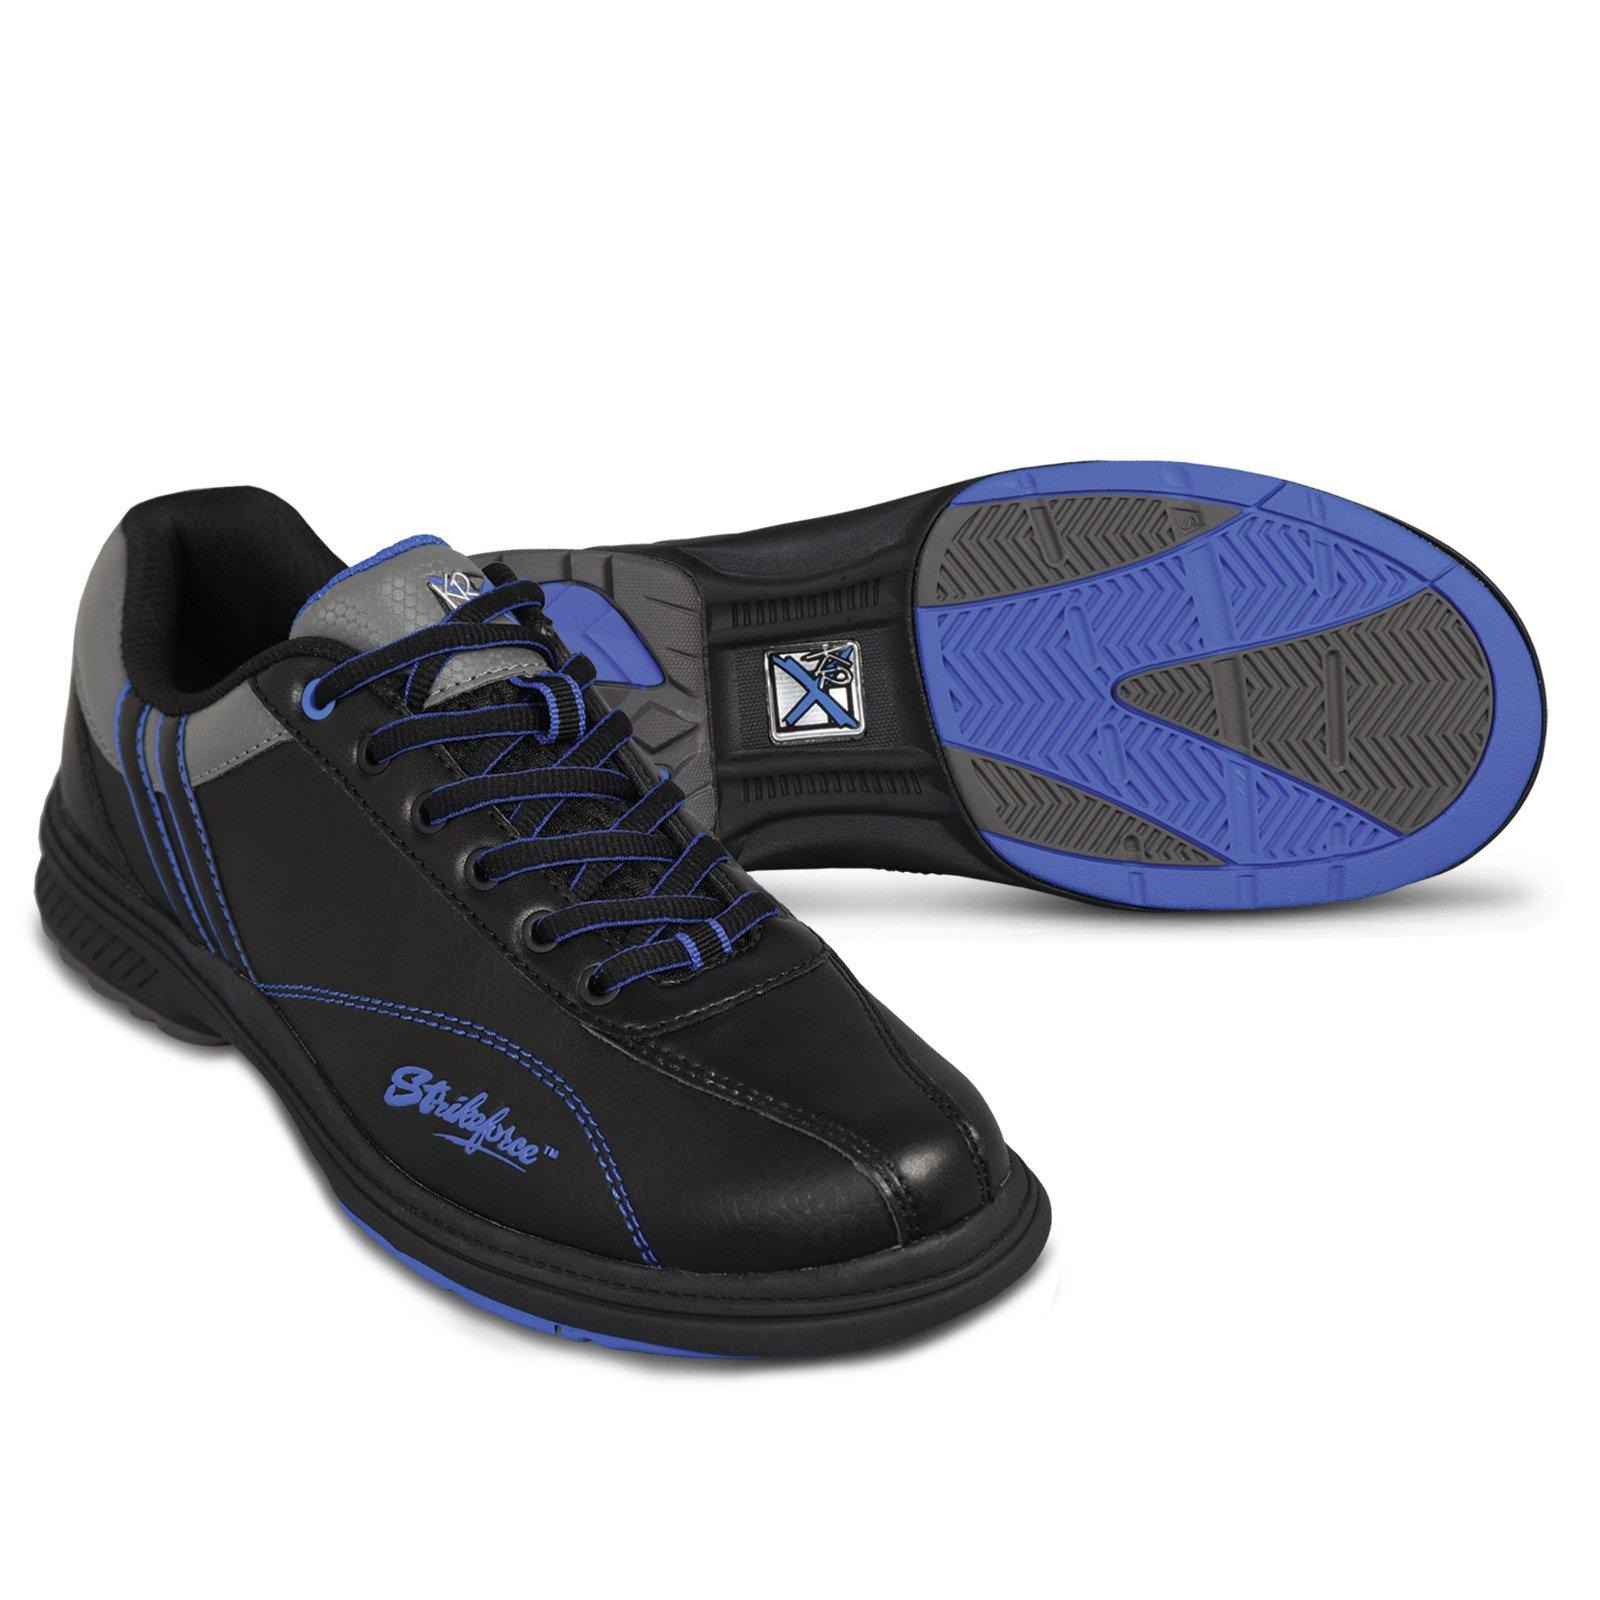 KR Strikeforce Men's Raptor Performance Wide Width Bowling Shoes, Black/Royal, Size 7